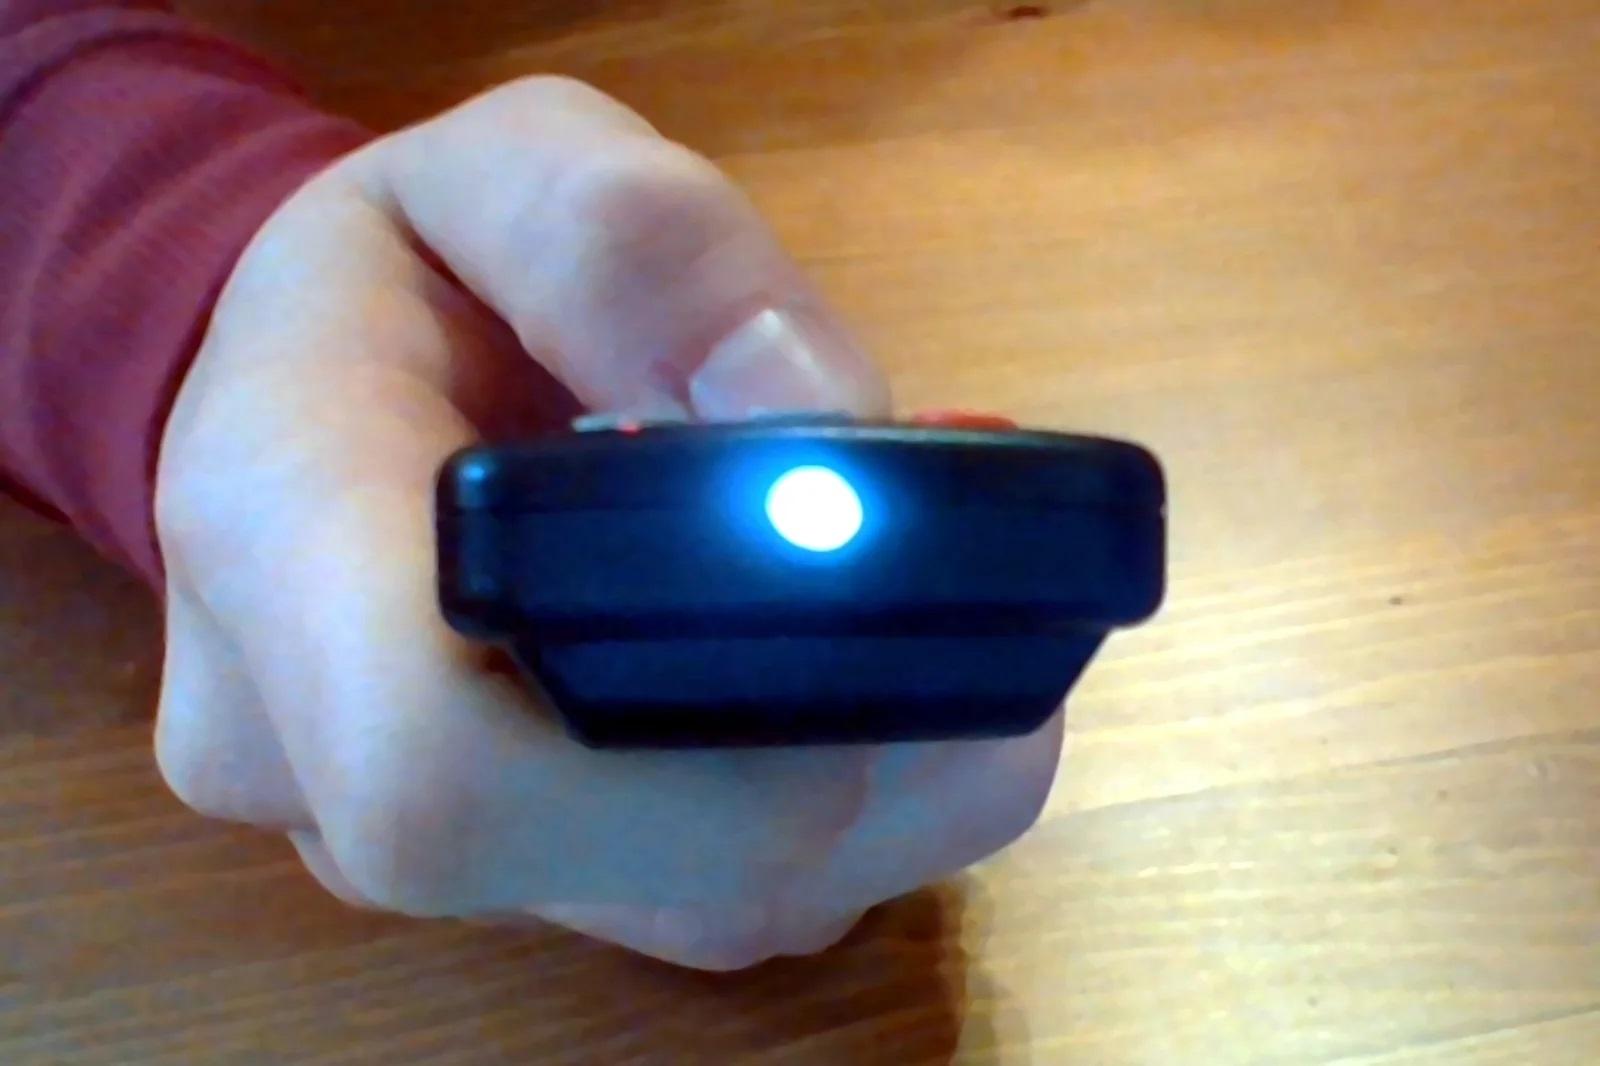 ИК-светодиод светит